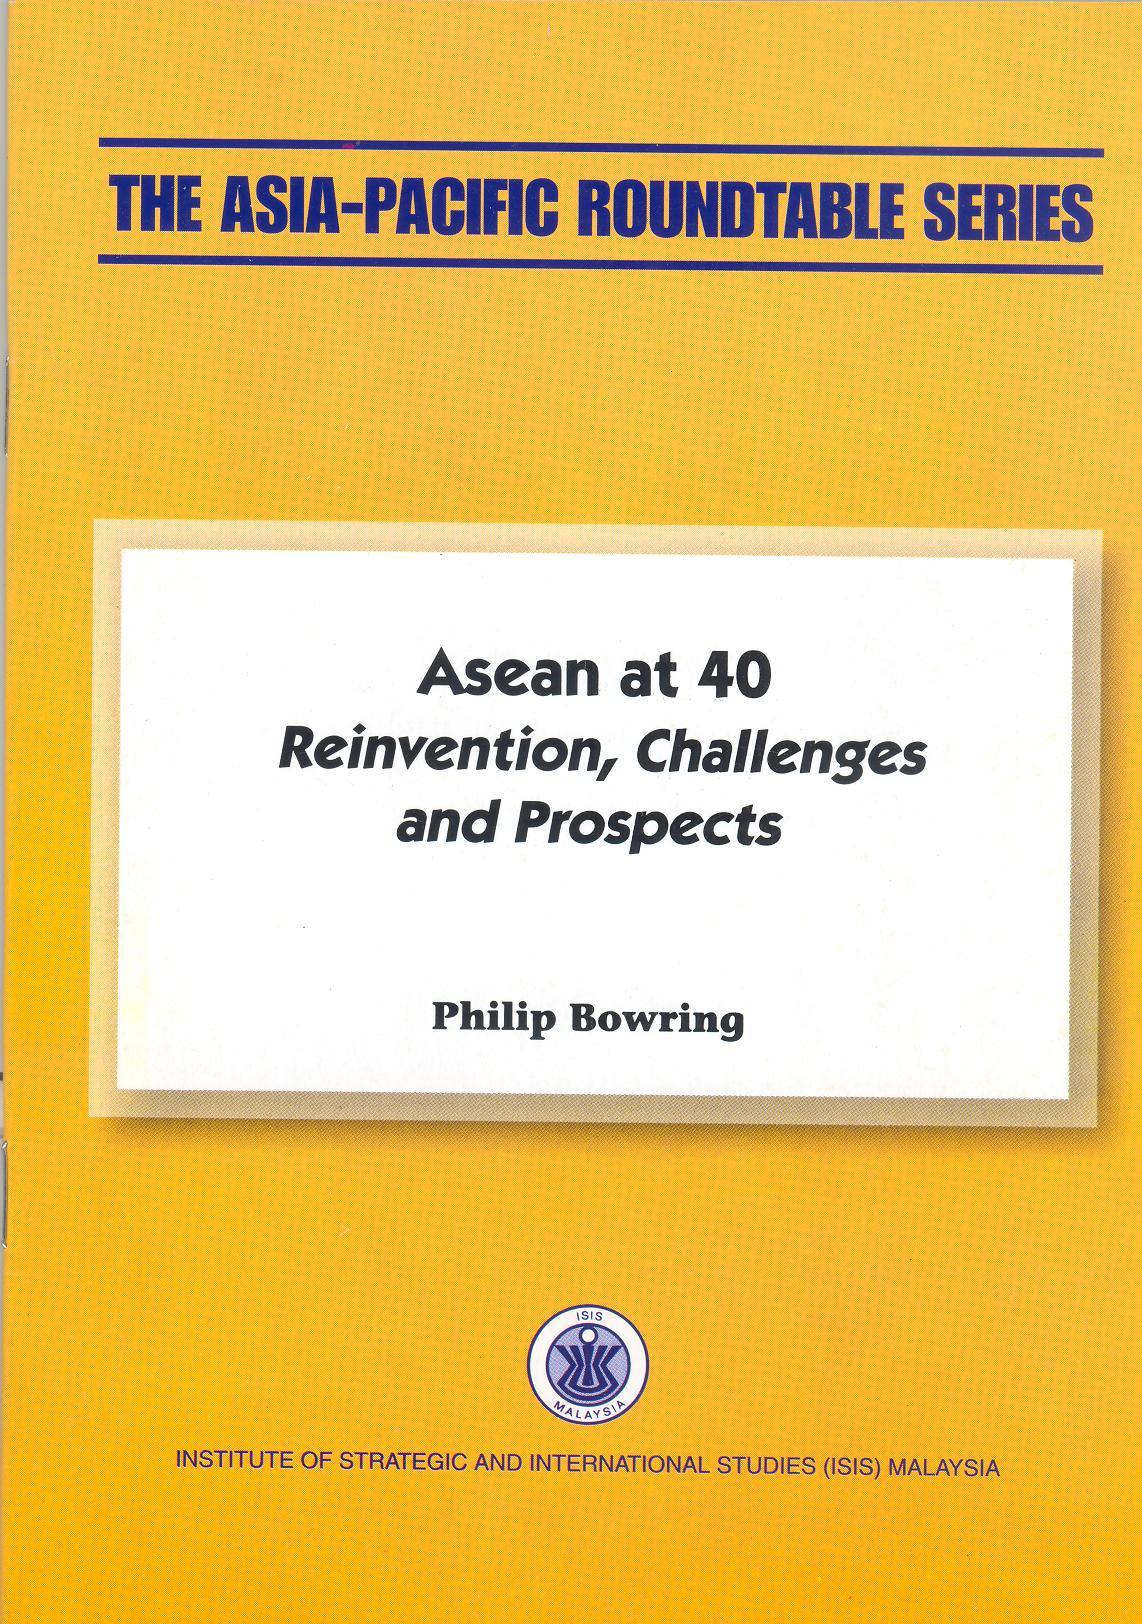 ASEAN AT 40